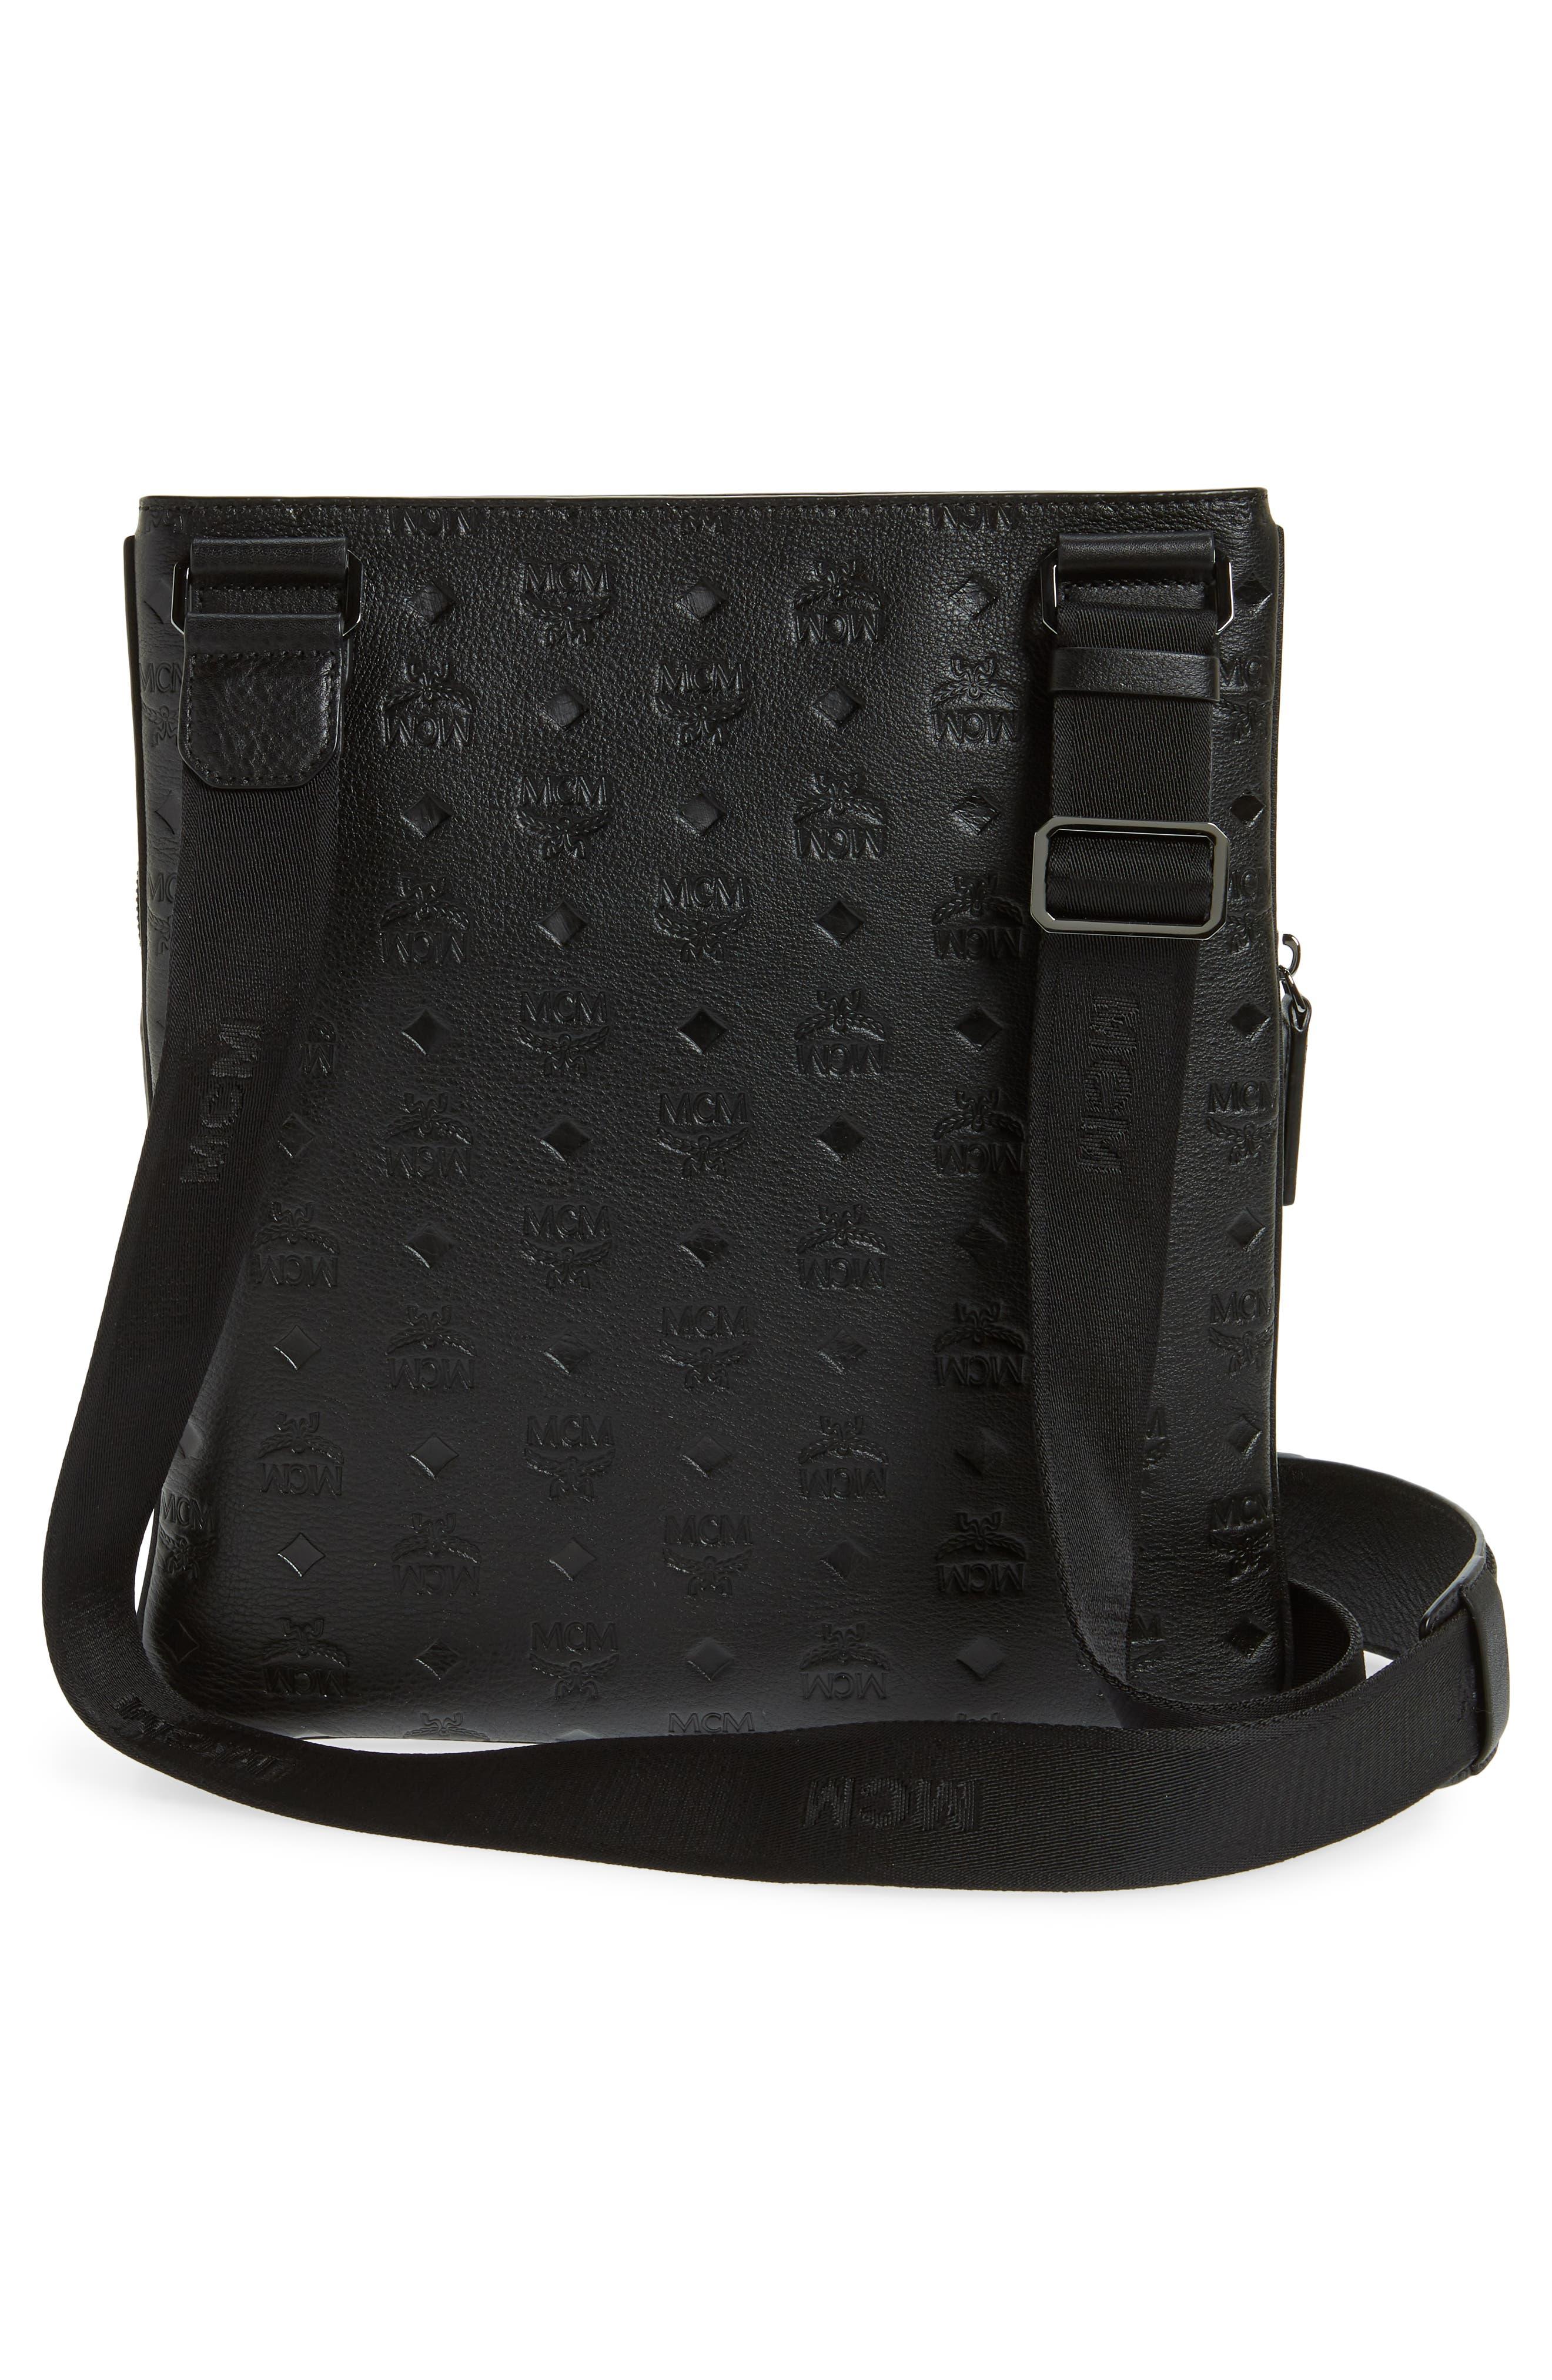 Ottomar Leather Crossbody Bag,                             Alternate thumbnail 3, color,                             001